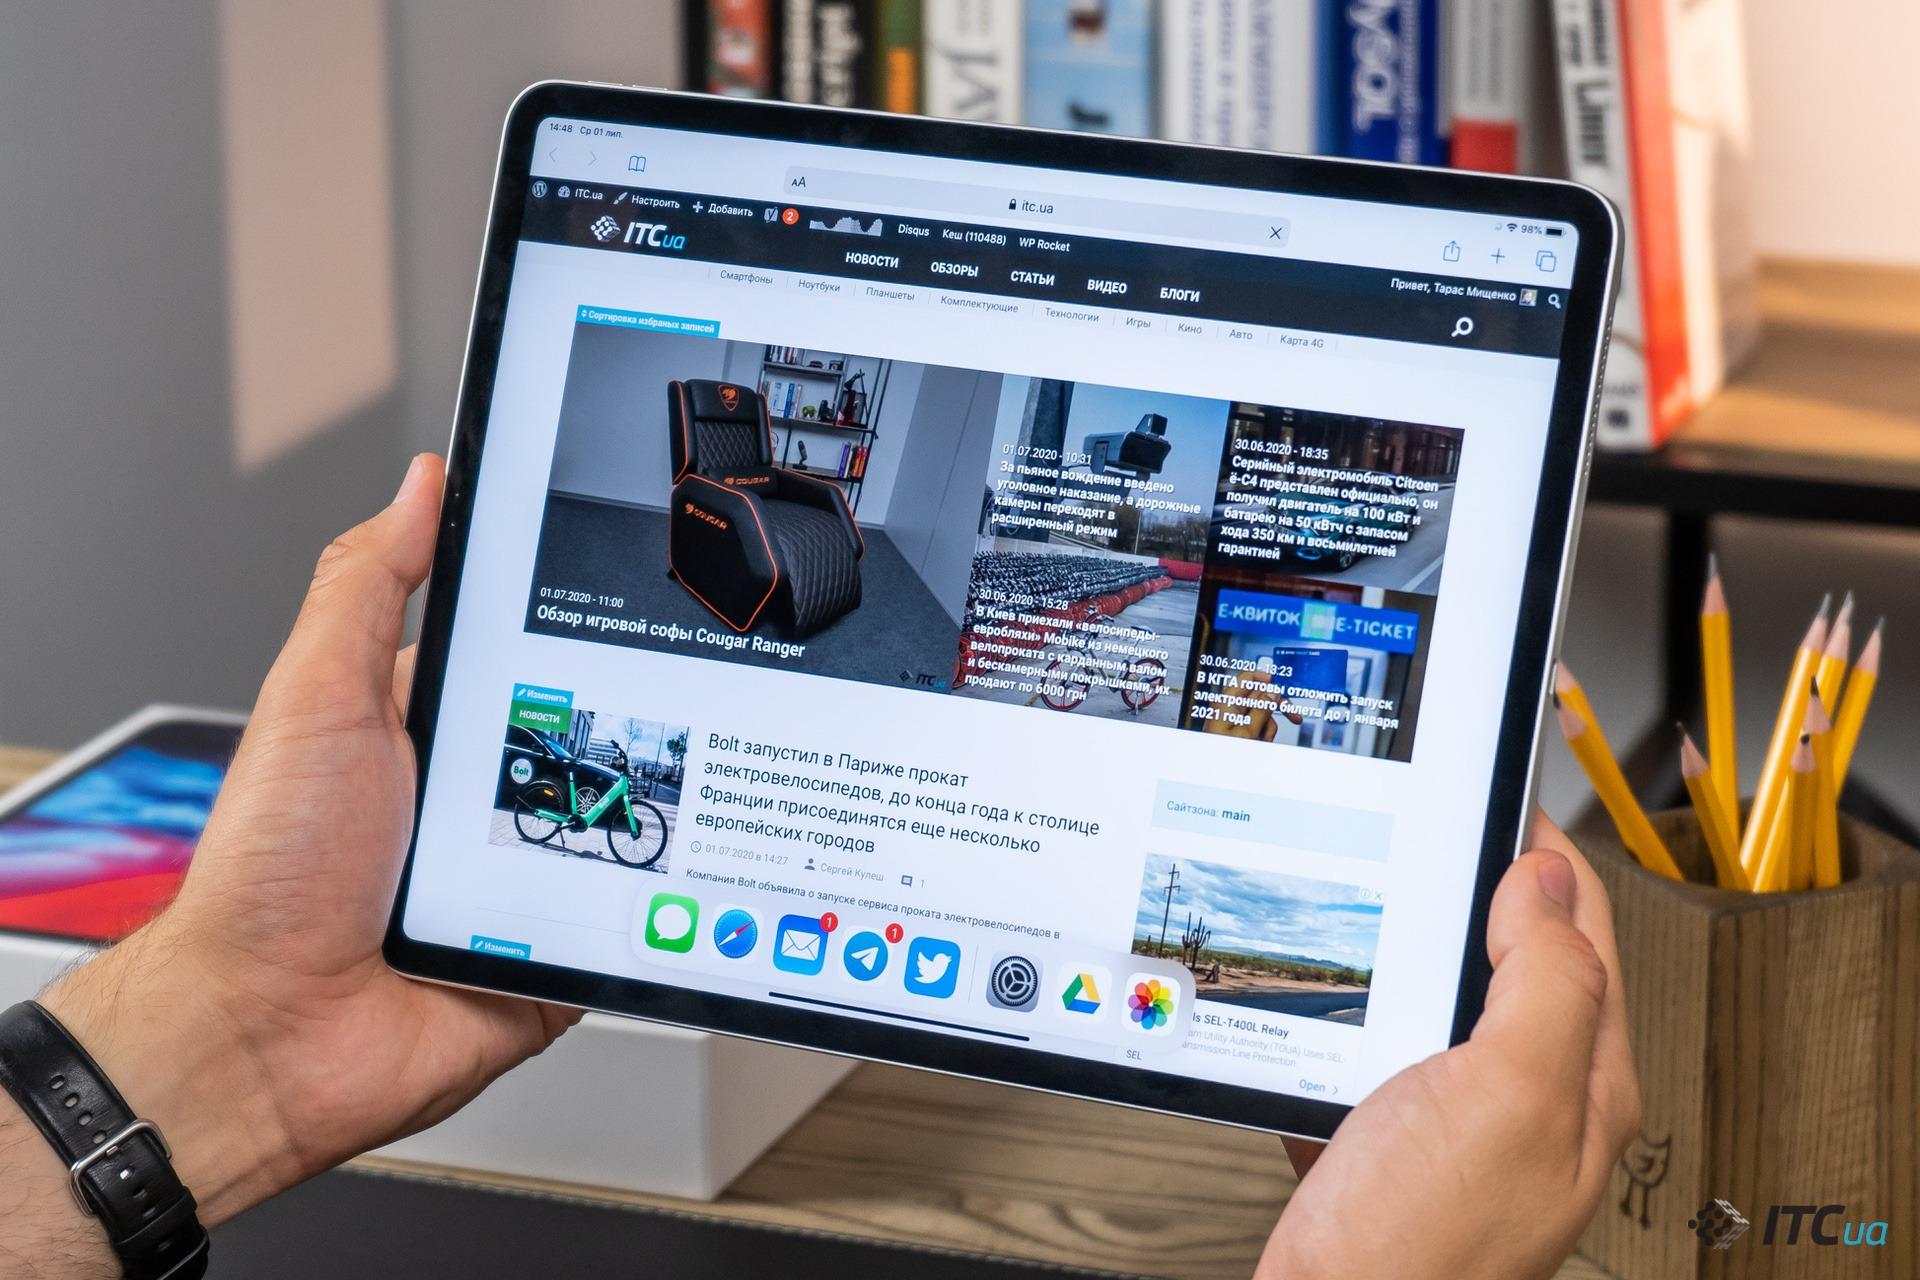 Обзор планшета iPad Pro 12.9 (4th generation)